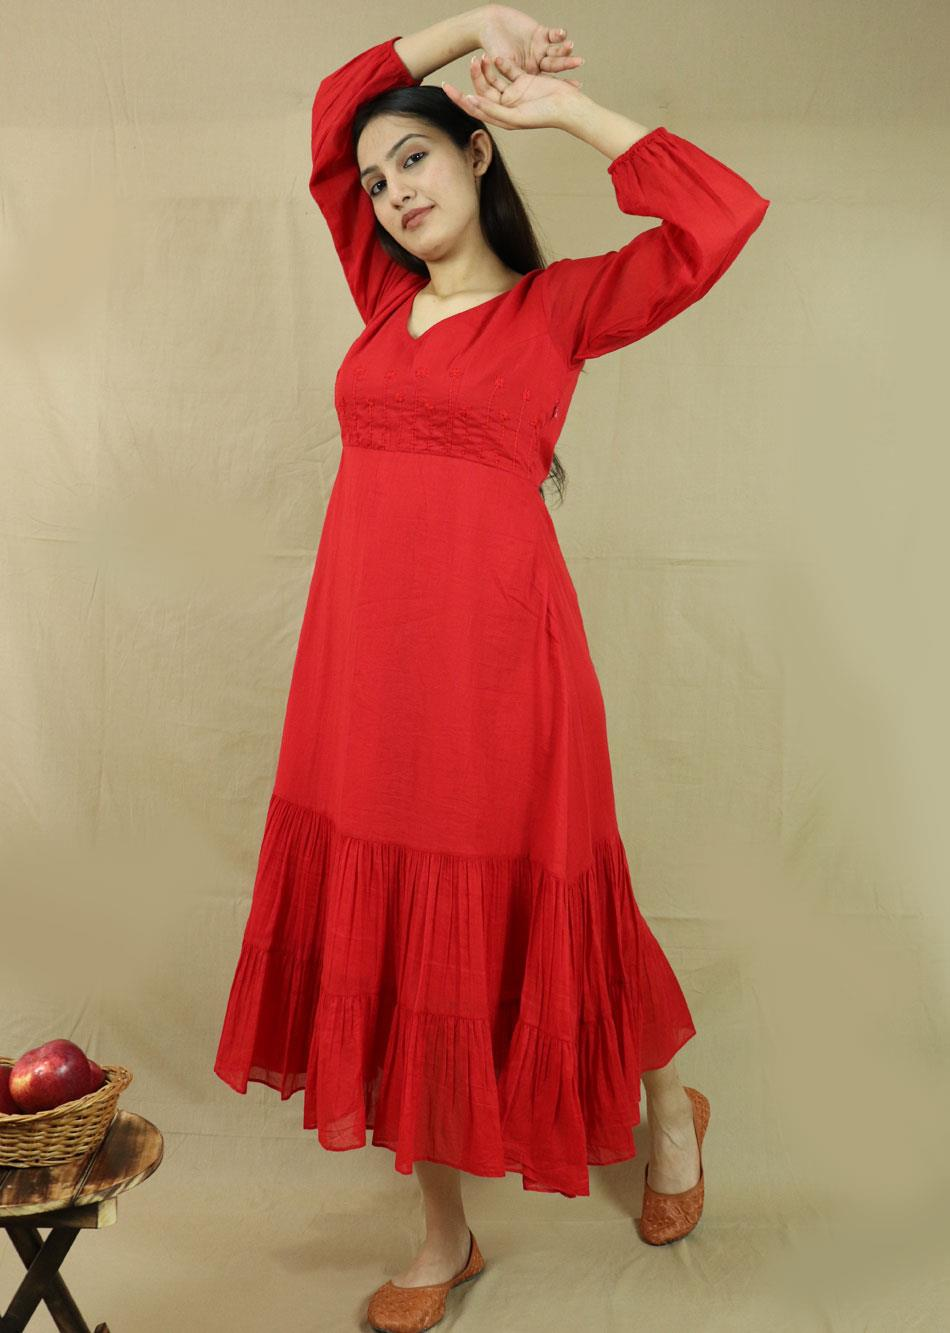 Red Midi Dress By Jovi Fashion